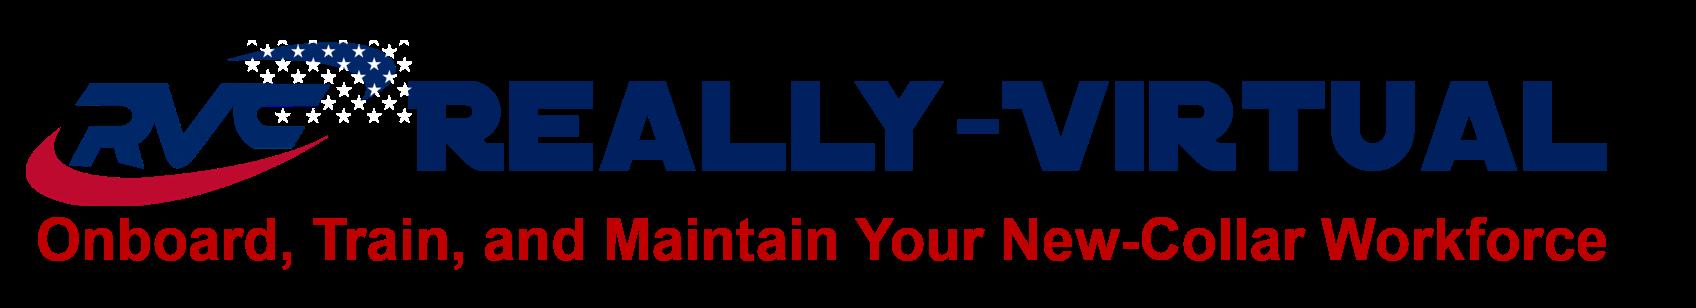 Really-Virtual Logo